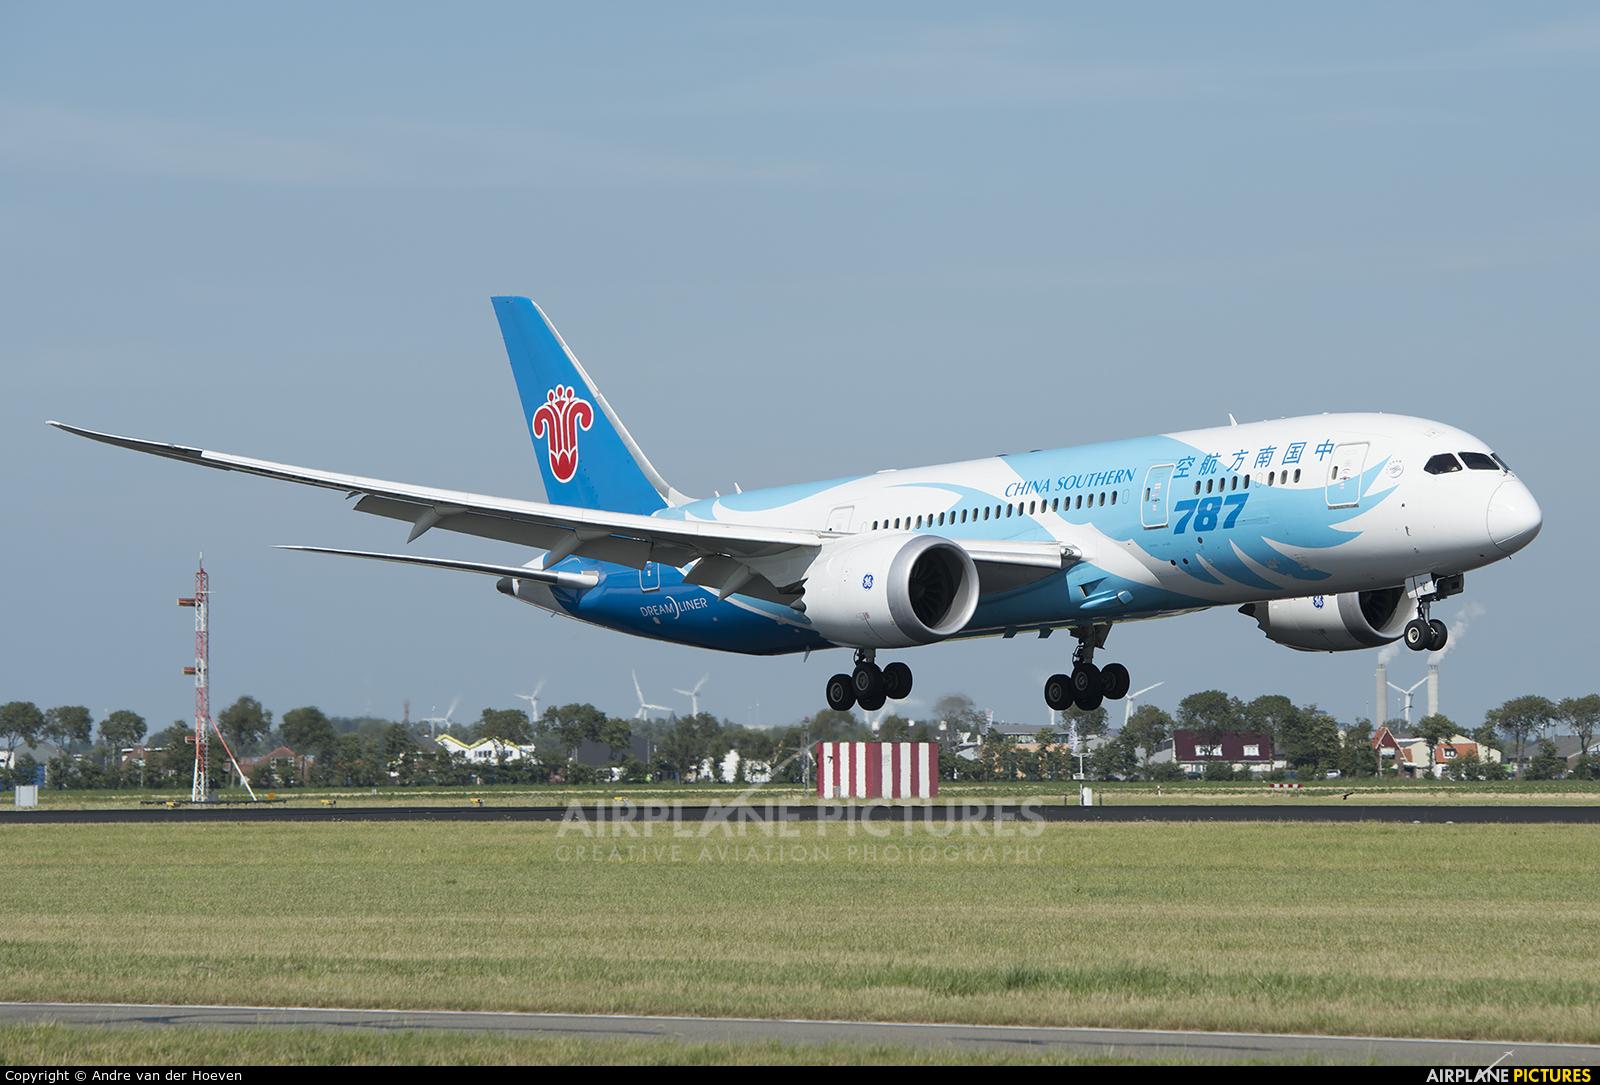 China Southern Airlines B-2737 aircraft at Amsterdam - Schiphol